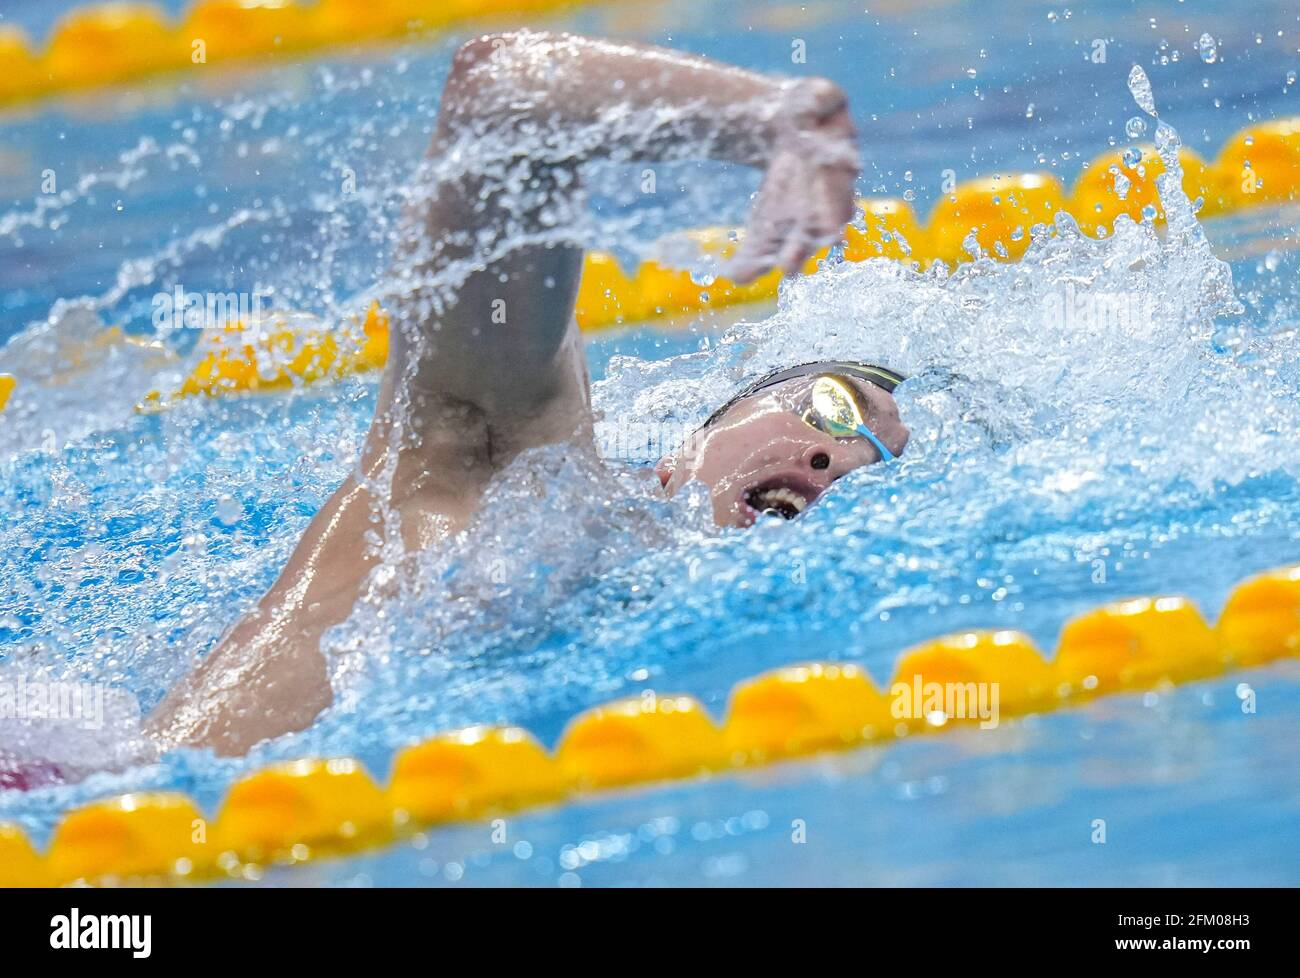 Qingdao, Cina. 5 maggio 2021. Cheng Long of Shandong compete durante la finale maschile di 800m freestyle al Campionato Nazionale Cinese di Nuoto 2021 a Qingdao, Cina orientale, 5 maggio 2021. Credit: Xu Chang/Xinhua/Alamy Live News Foto Stock